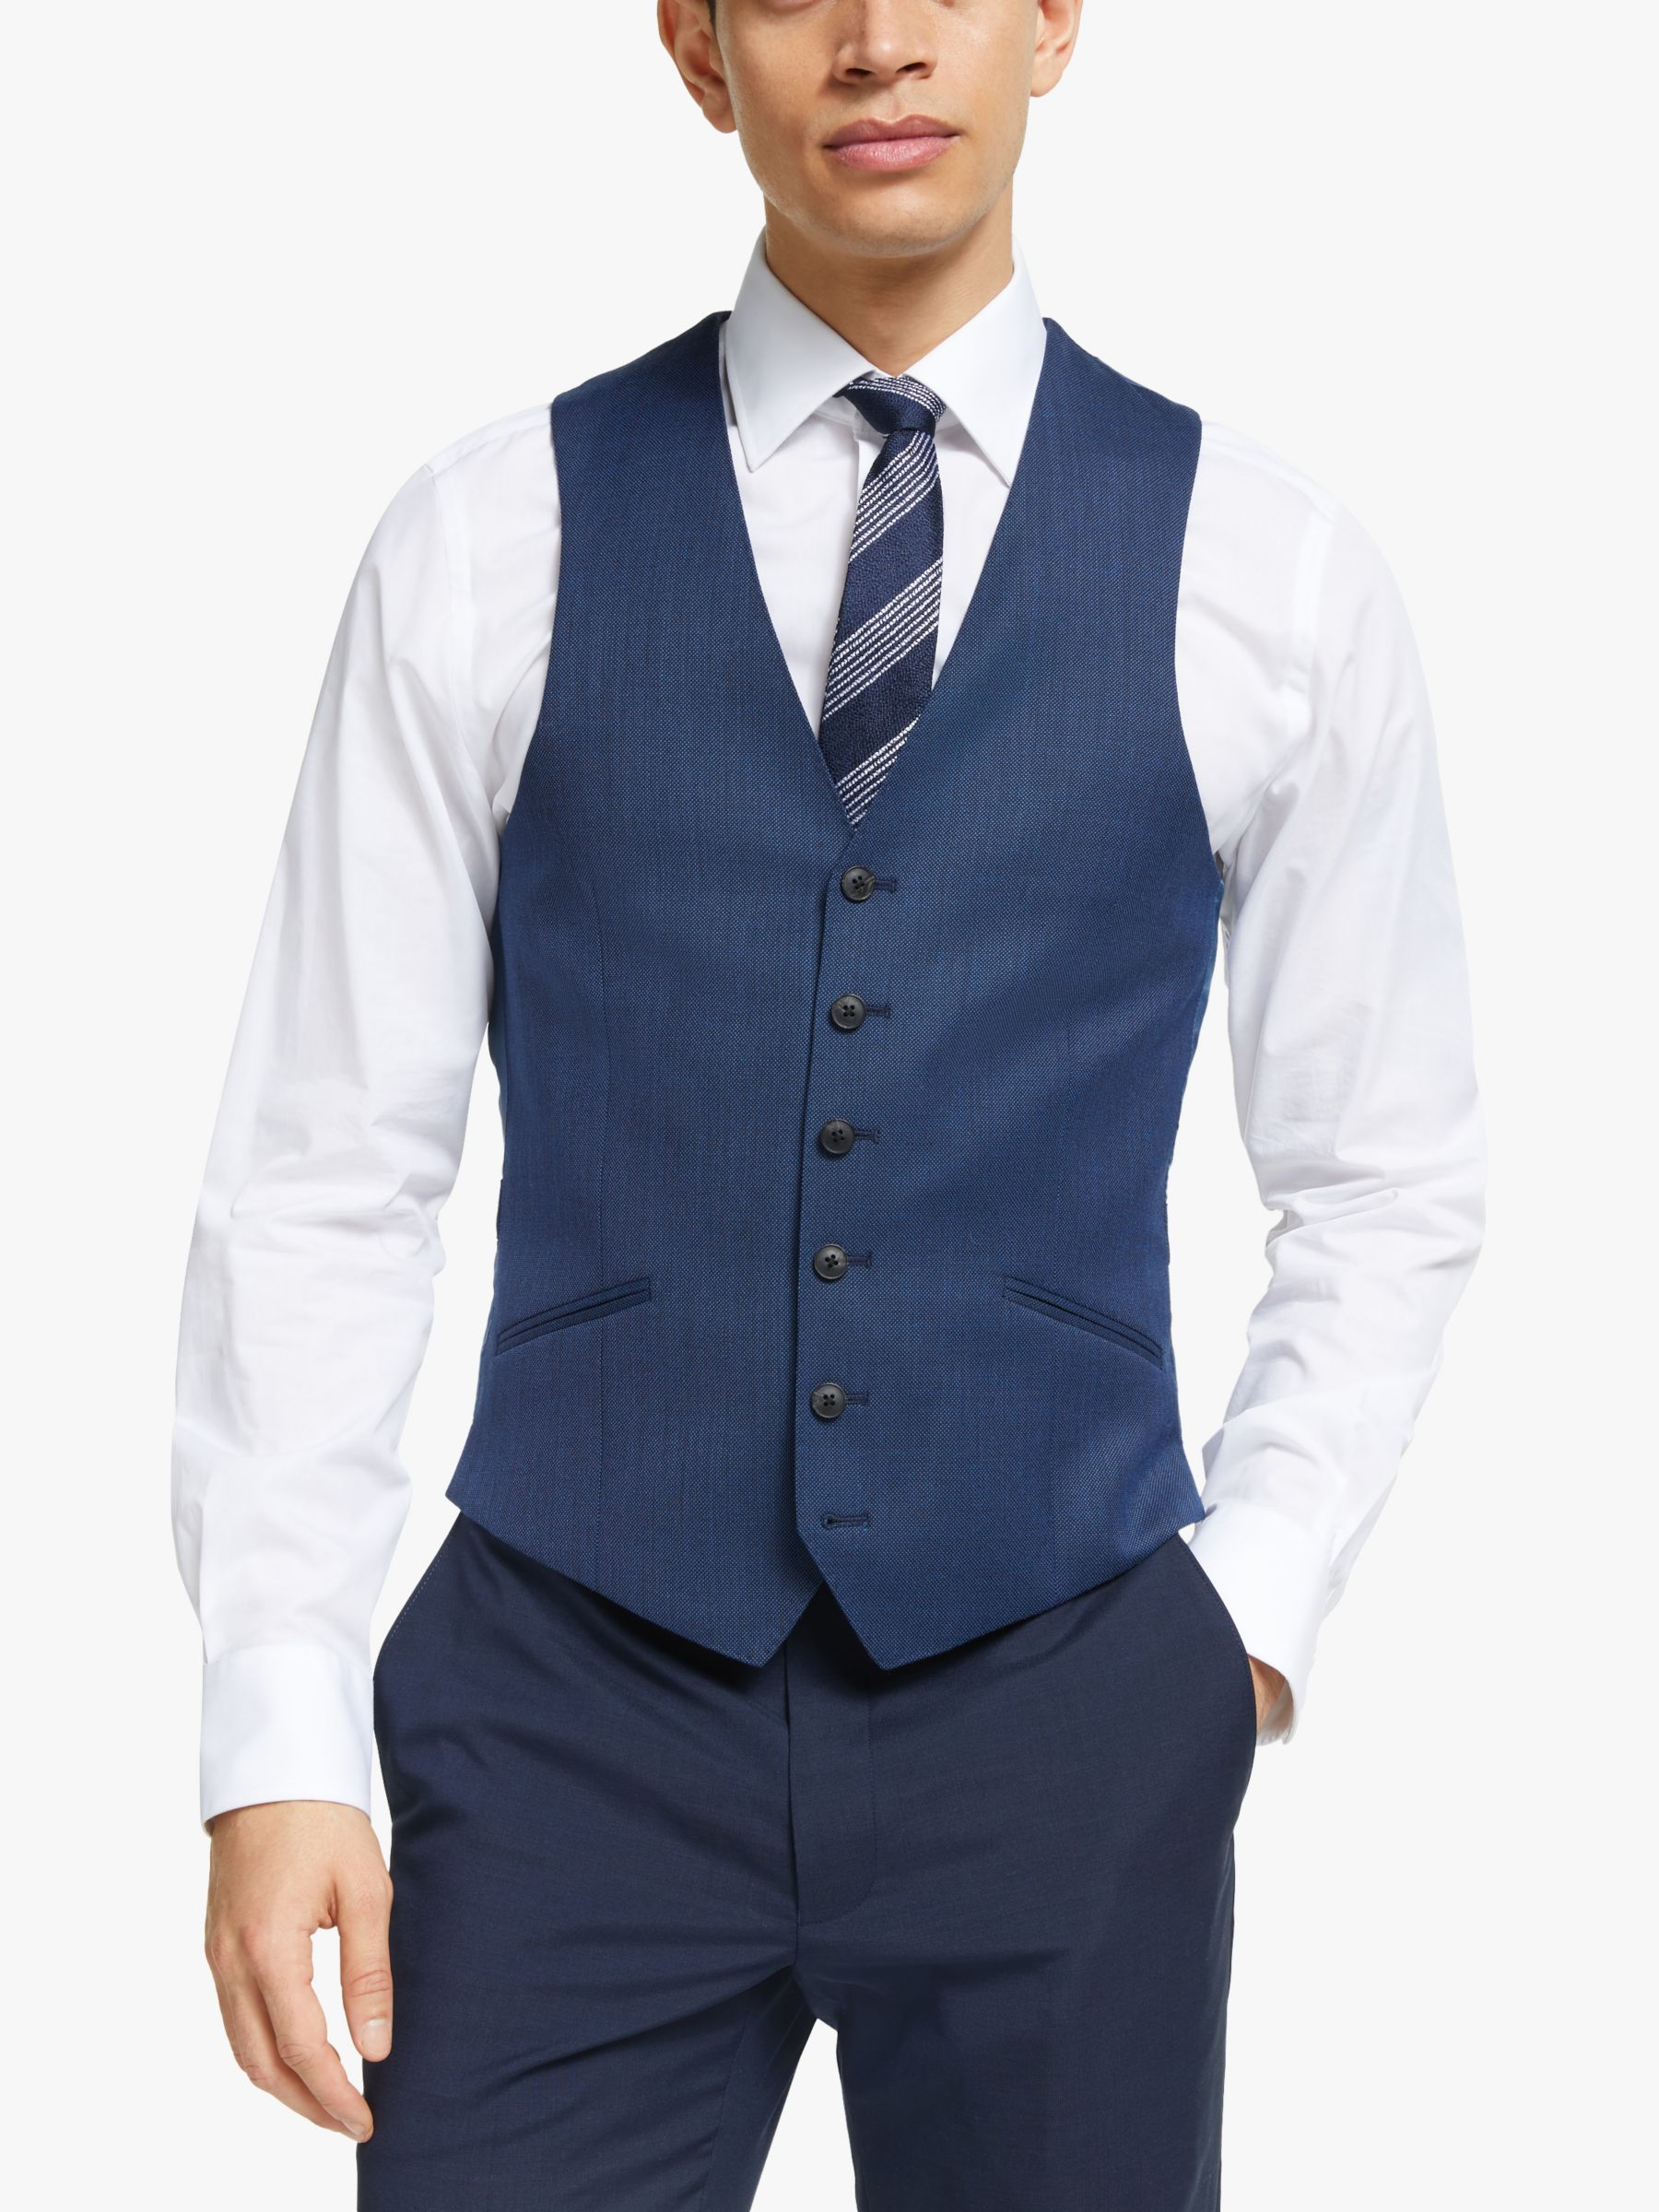 Richard James Mayfair Richard James Mayfair Geo Wool Tailored Waistcoat, Dark Blue